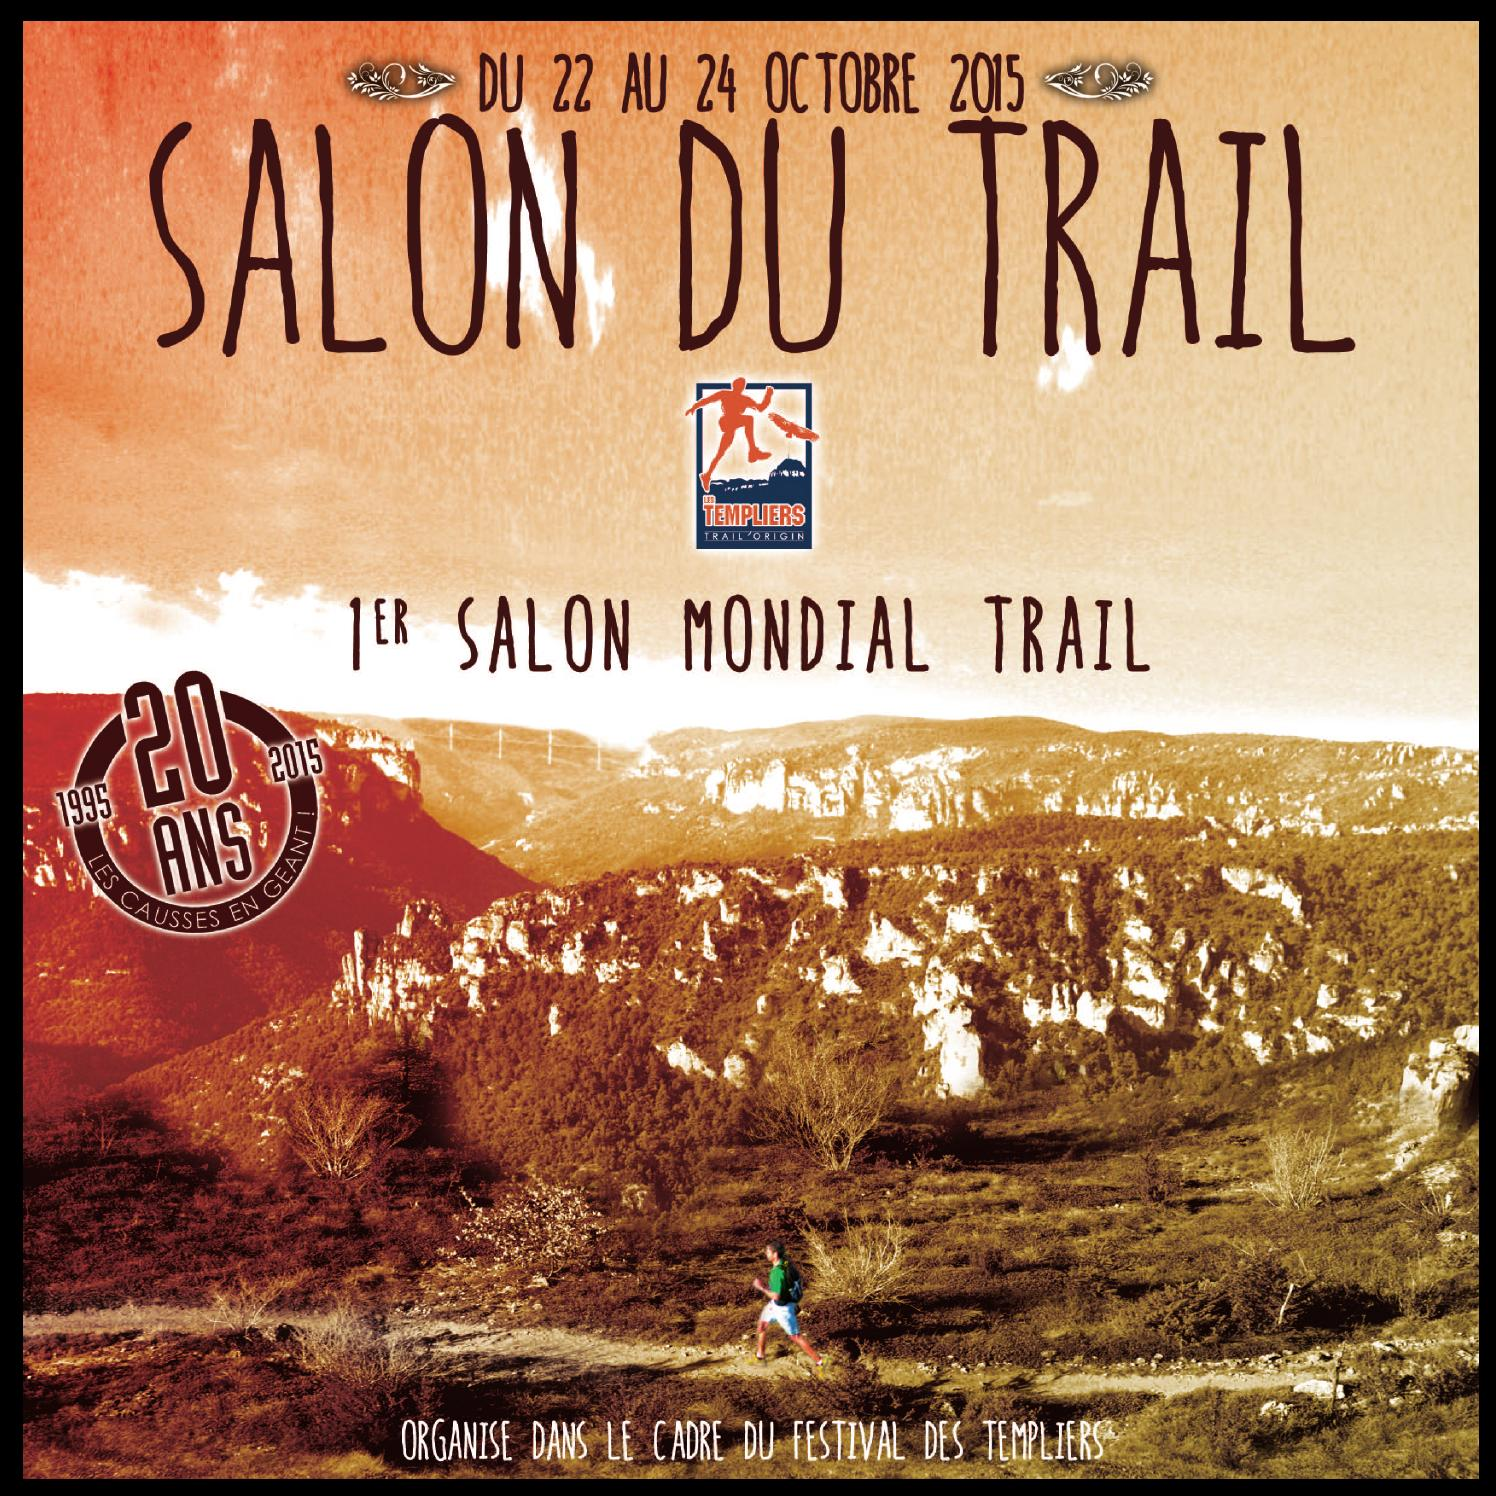 salon du trail 2015 by bertrand gilles issuu